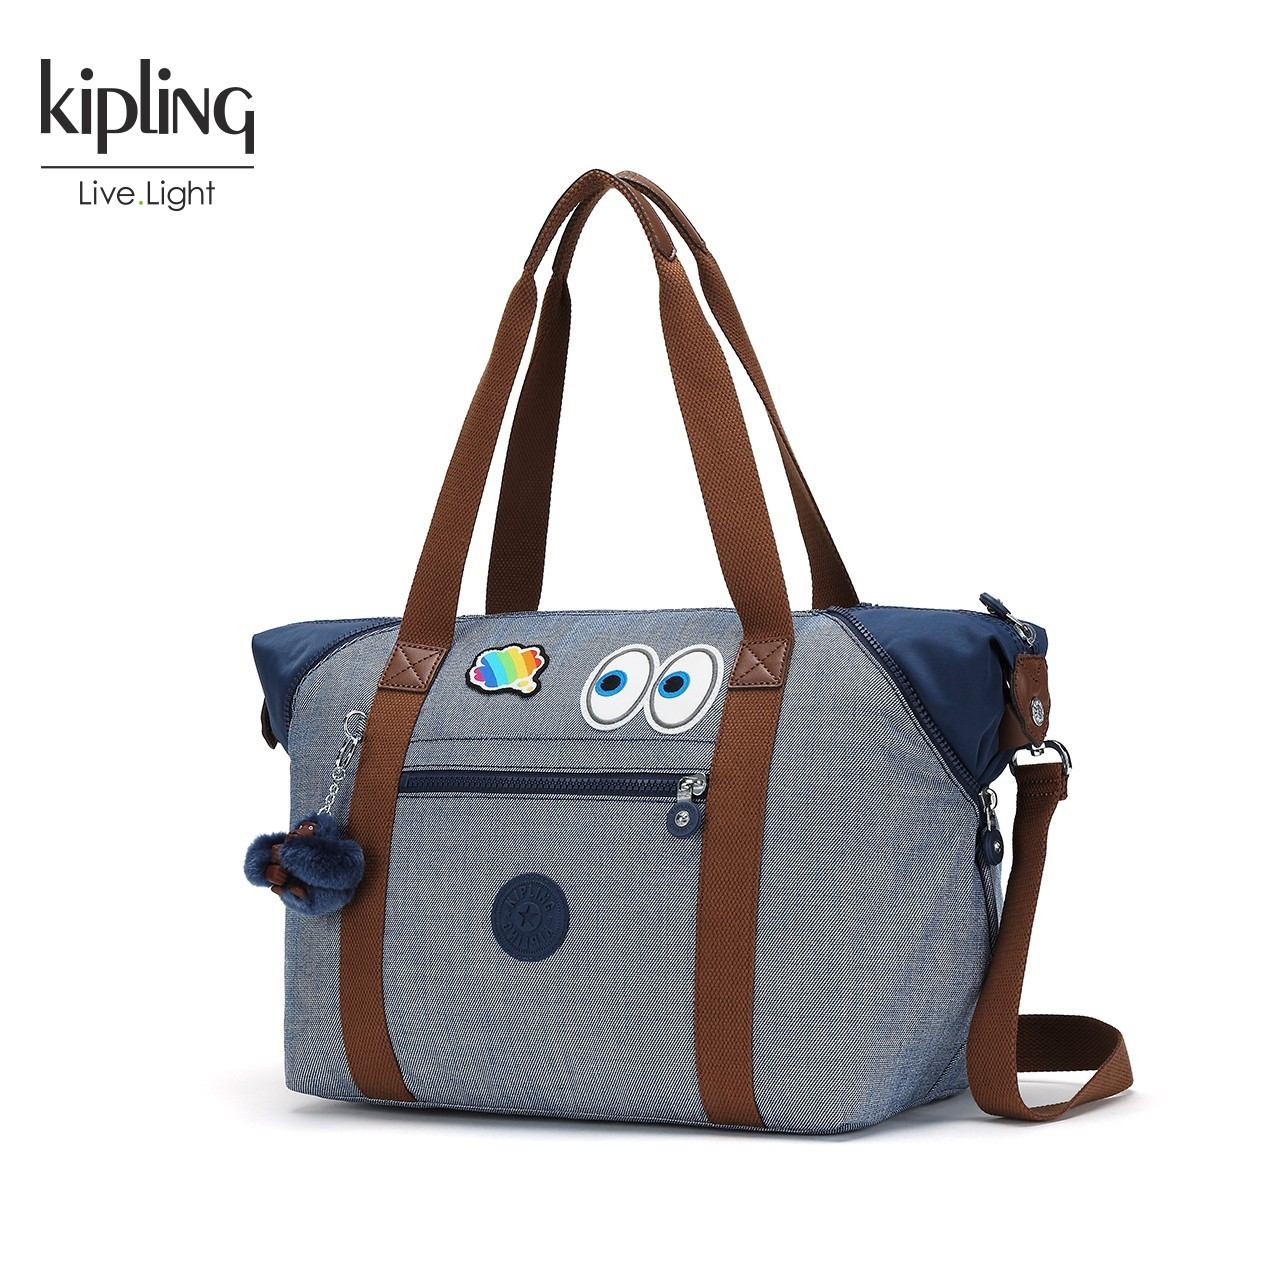 KiplingX Emoji表情联名款 潮款出街女包手提包休闲单肩斜挎包